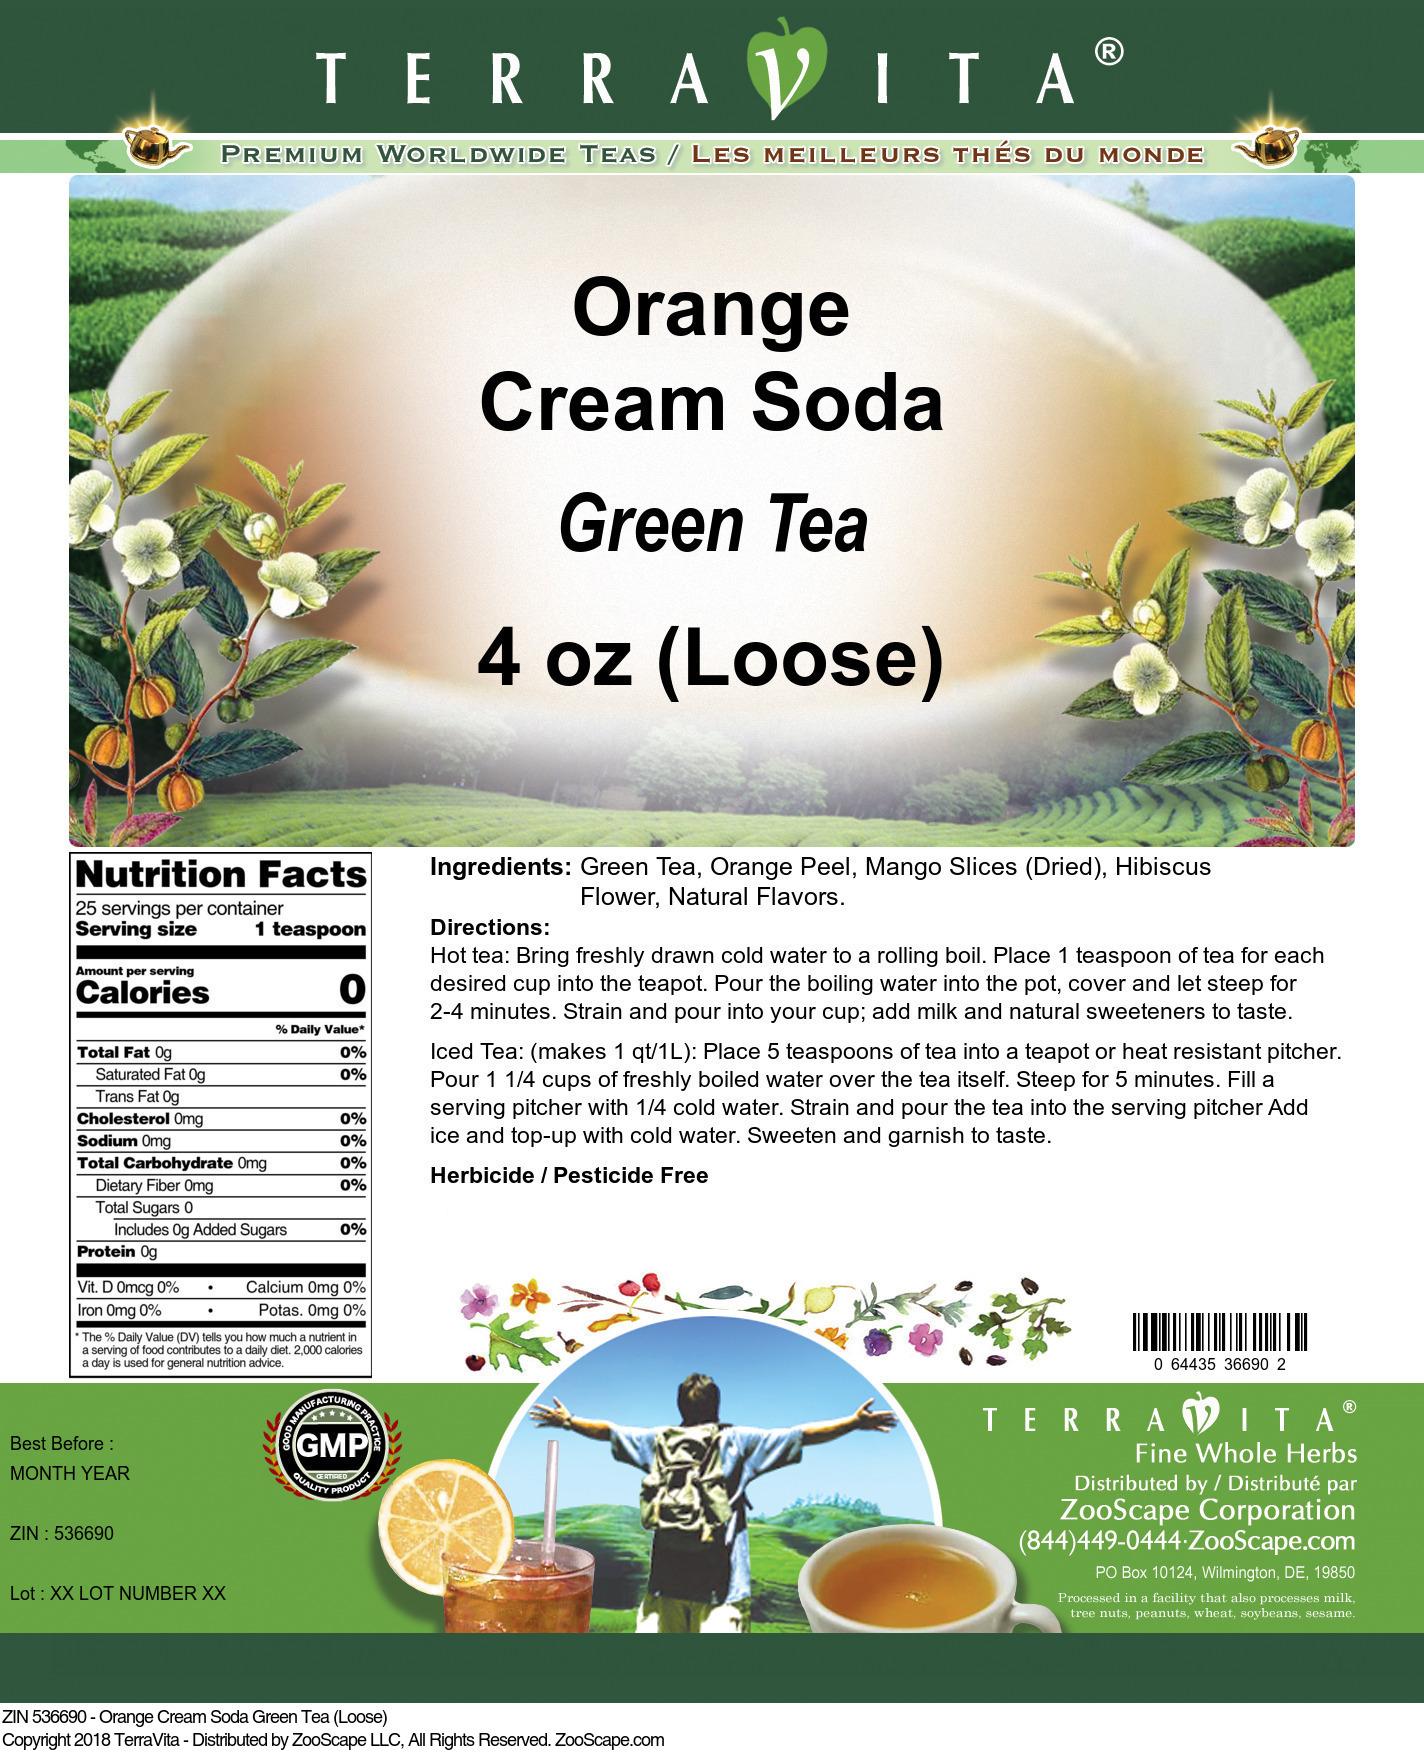 Orange Cream Soda Green Tea (Loose)